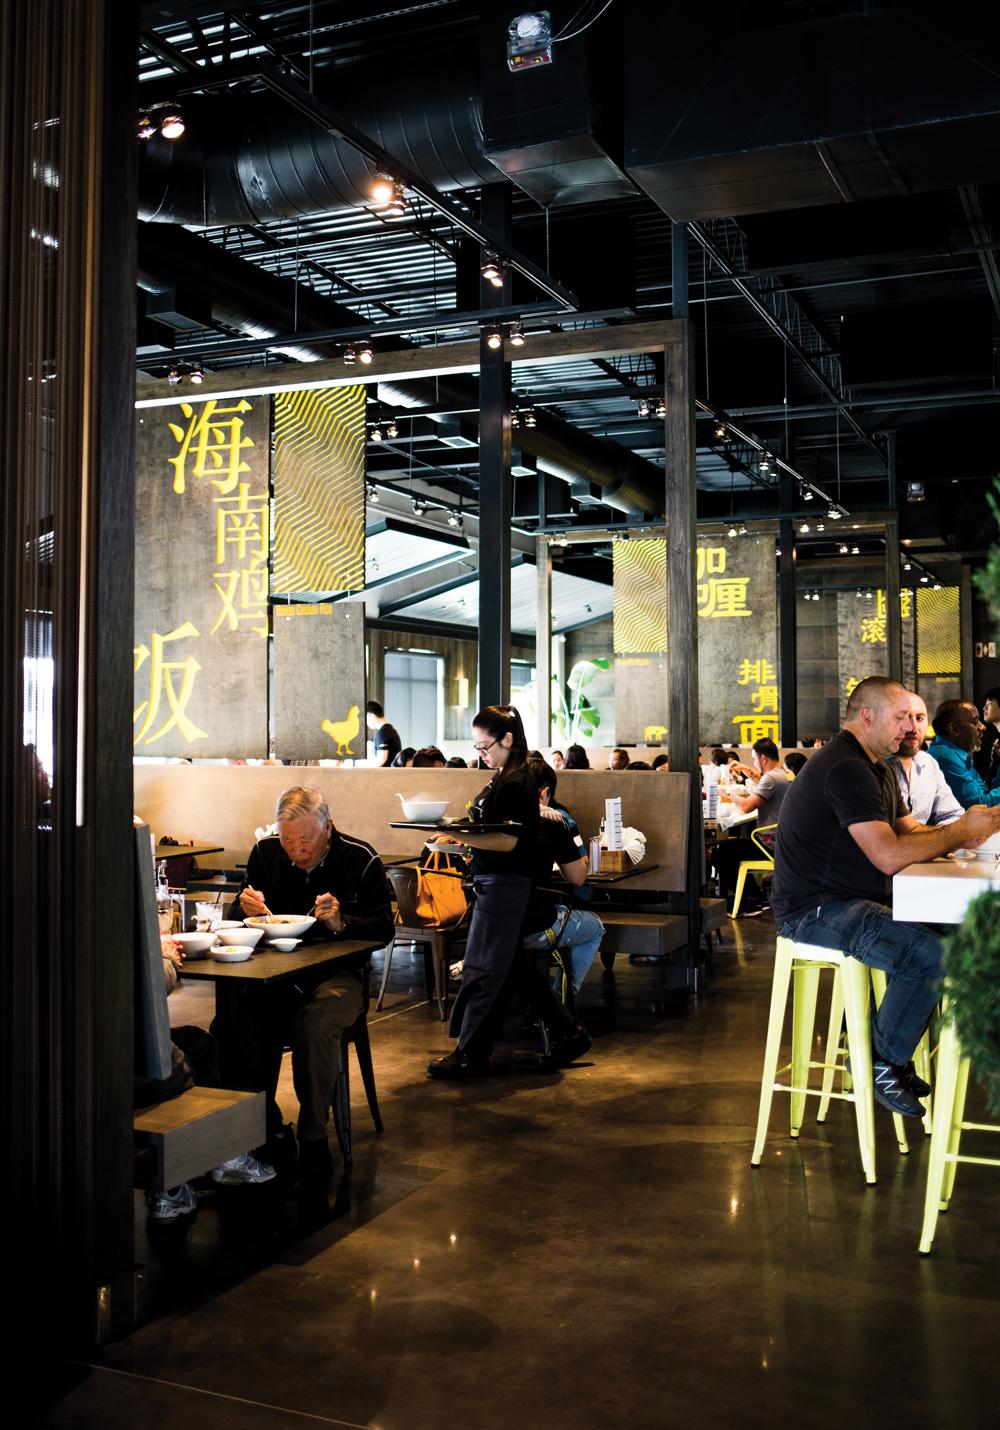 New Best Nails Nwa Mall Fayetteville Home: Atlanta's Best New Restaurants 2017: Food Terminal